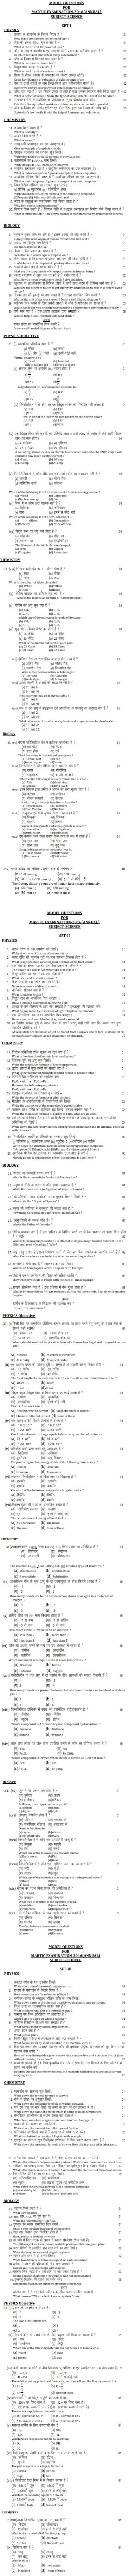 Bihar Board Class X Model Question Papers - Science